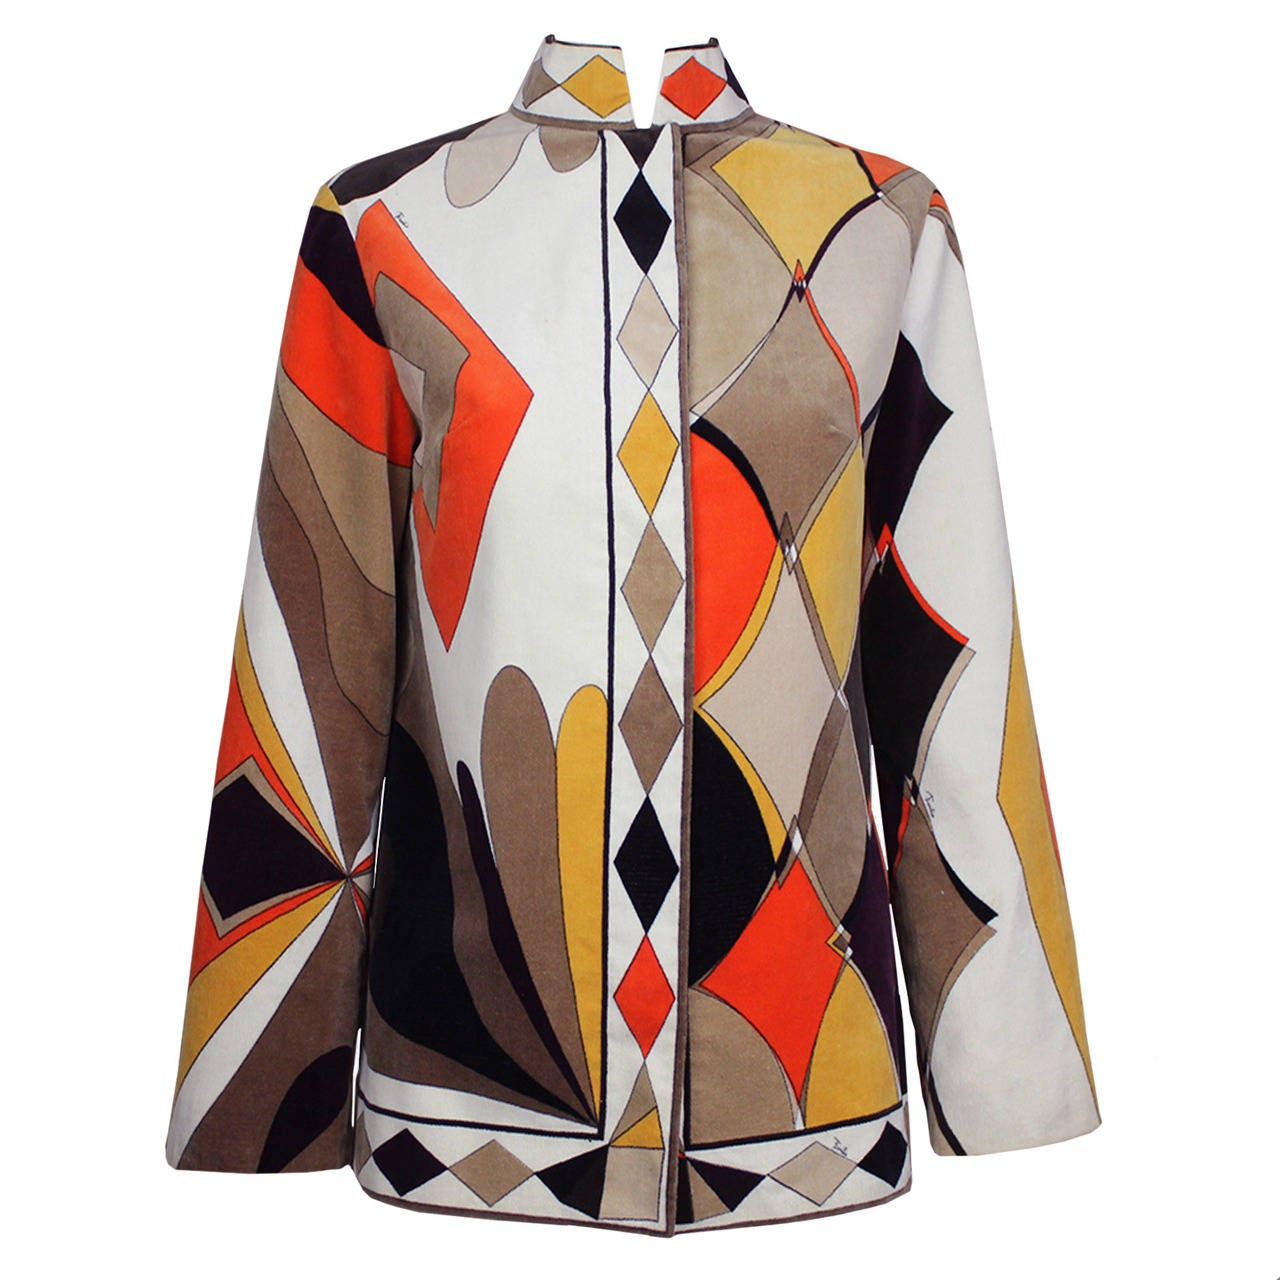 Emilio Pucci 1960s Geometric Print Velvet Jacket